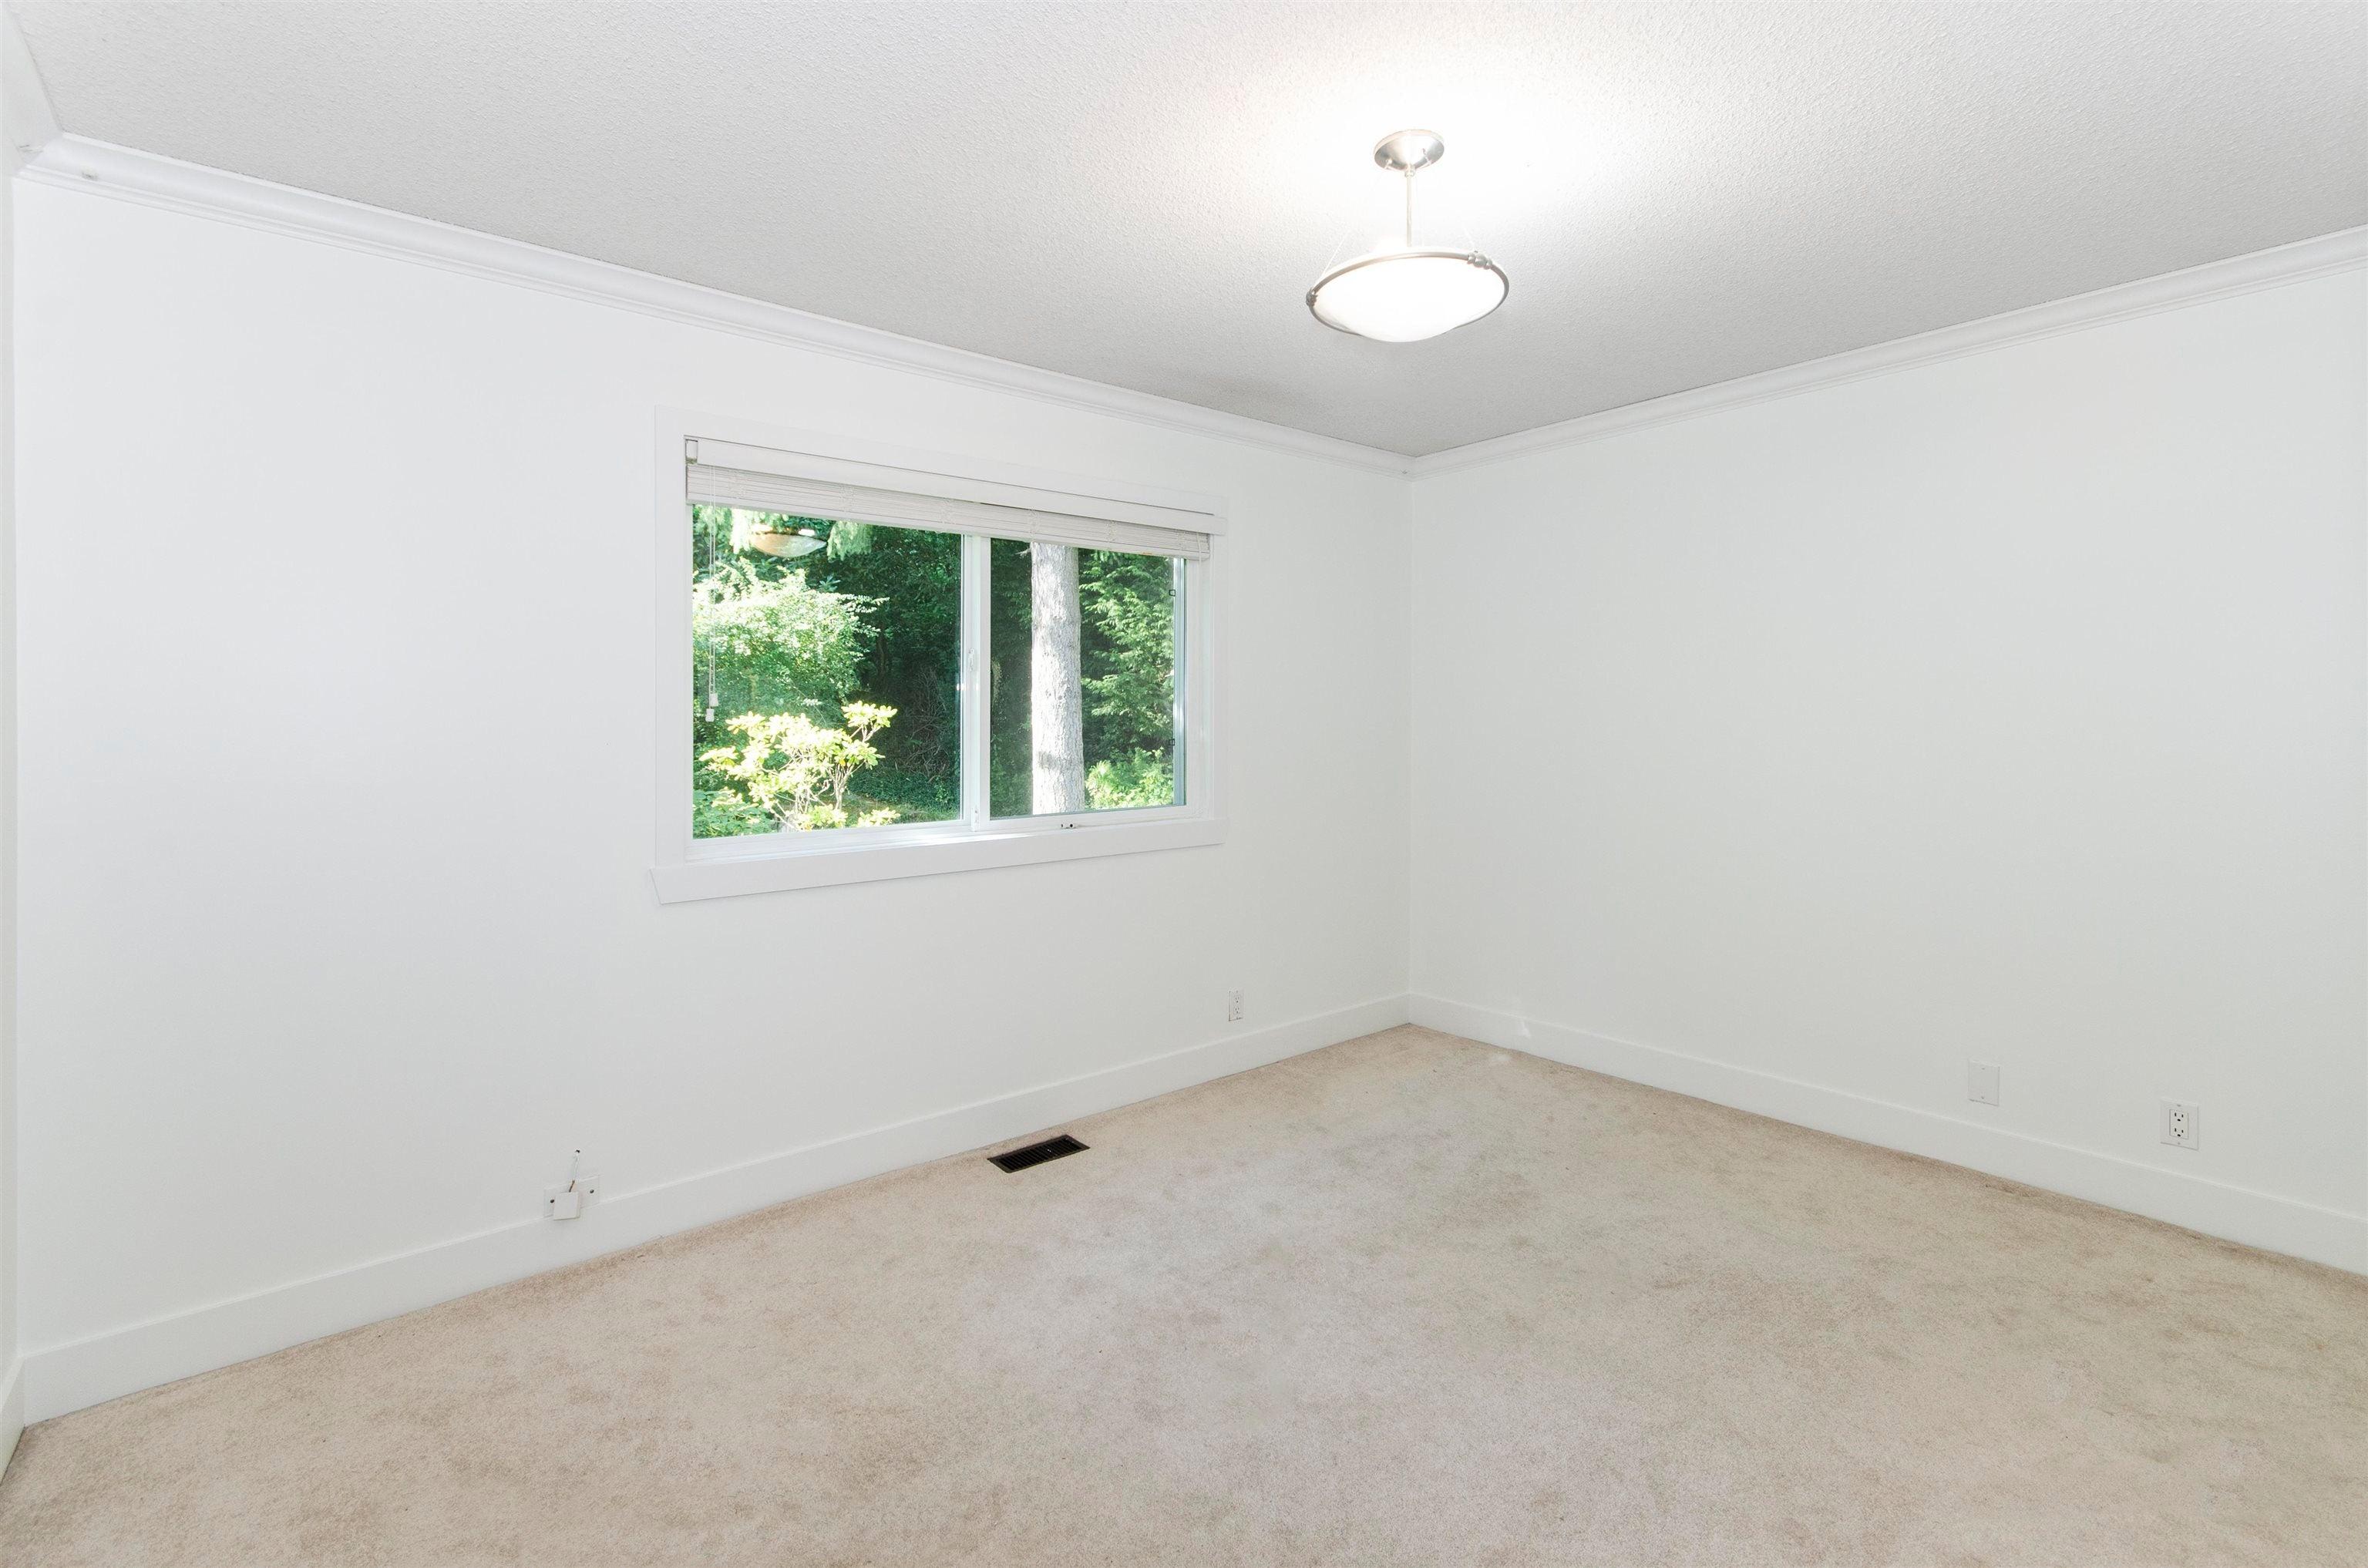 3785 REGENT AVENUE - Upper Lonsdale House/Single Family for sale, 4 Bedrooms (R2617648) - #15